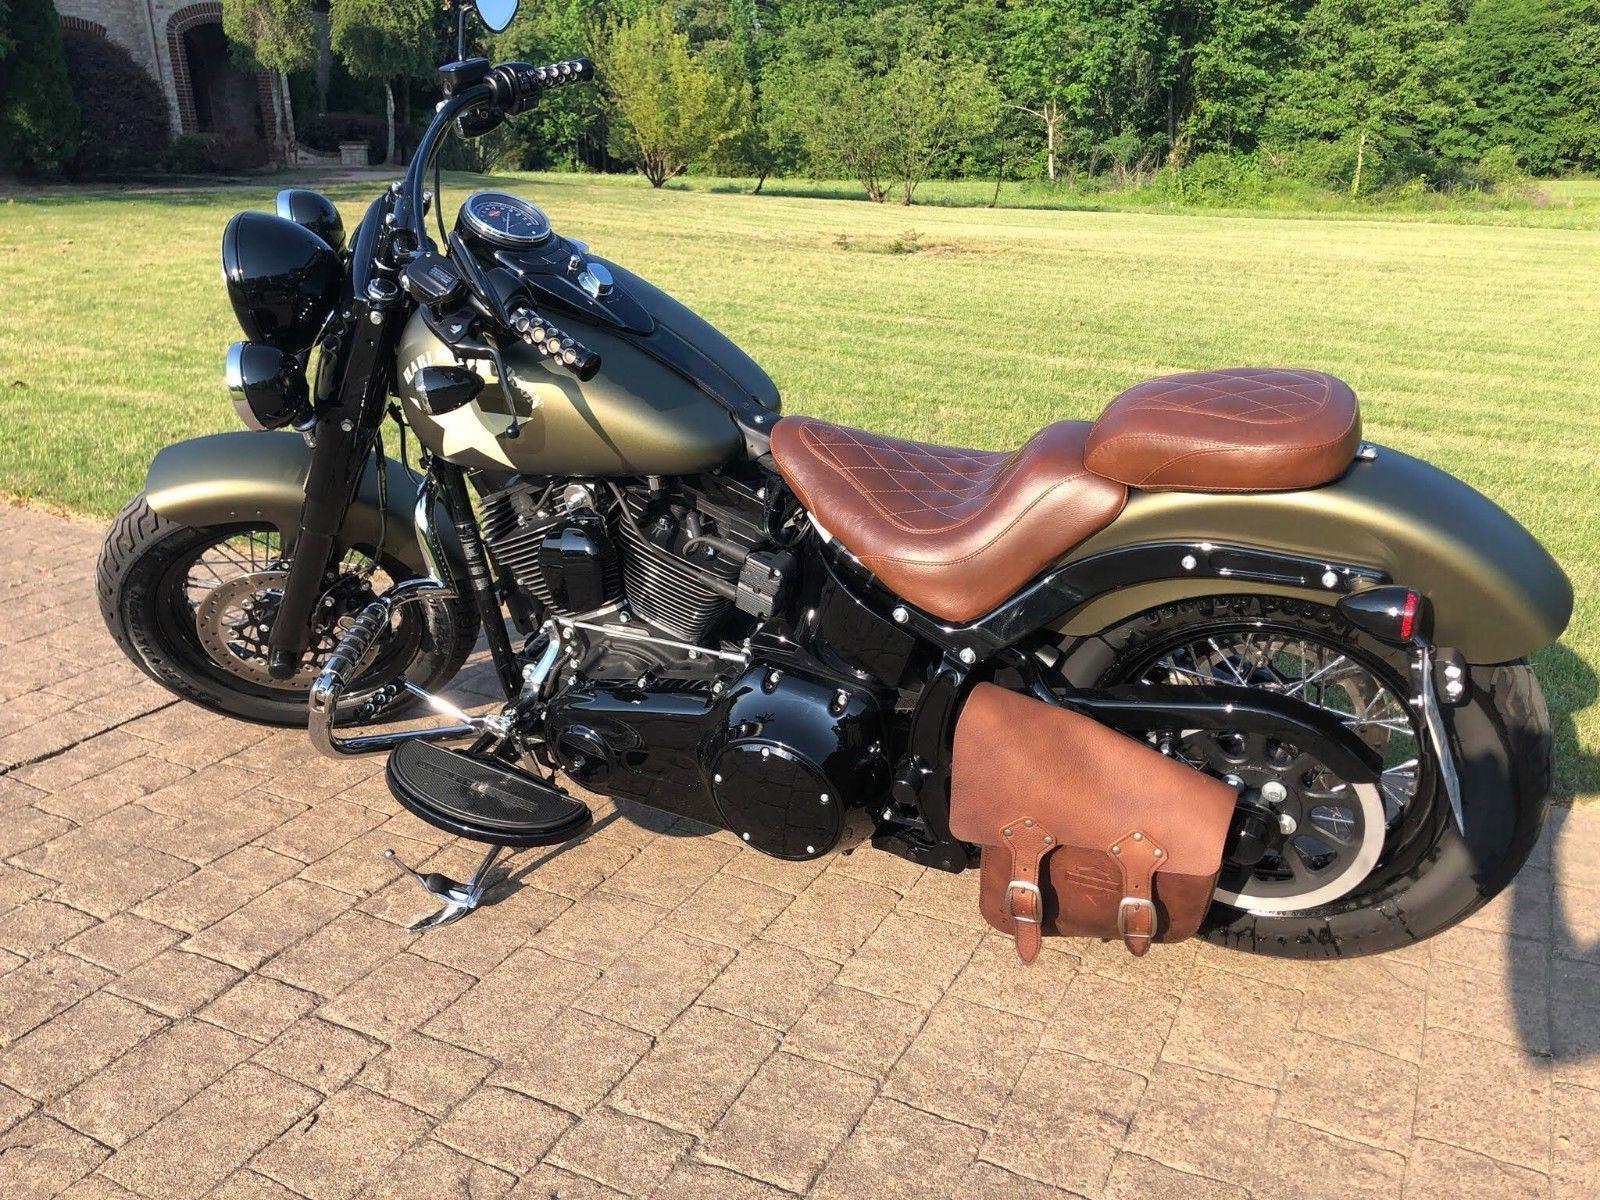 Ebay 2016 Harley Davidson Flss Softail Slim S 2016 Harley Davidson Flss So In 2020 Harley Davidson Images Harley Davidson Motorcycles Fatboy Harley Davidson Bikes